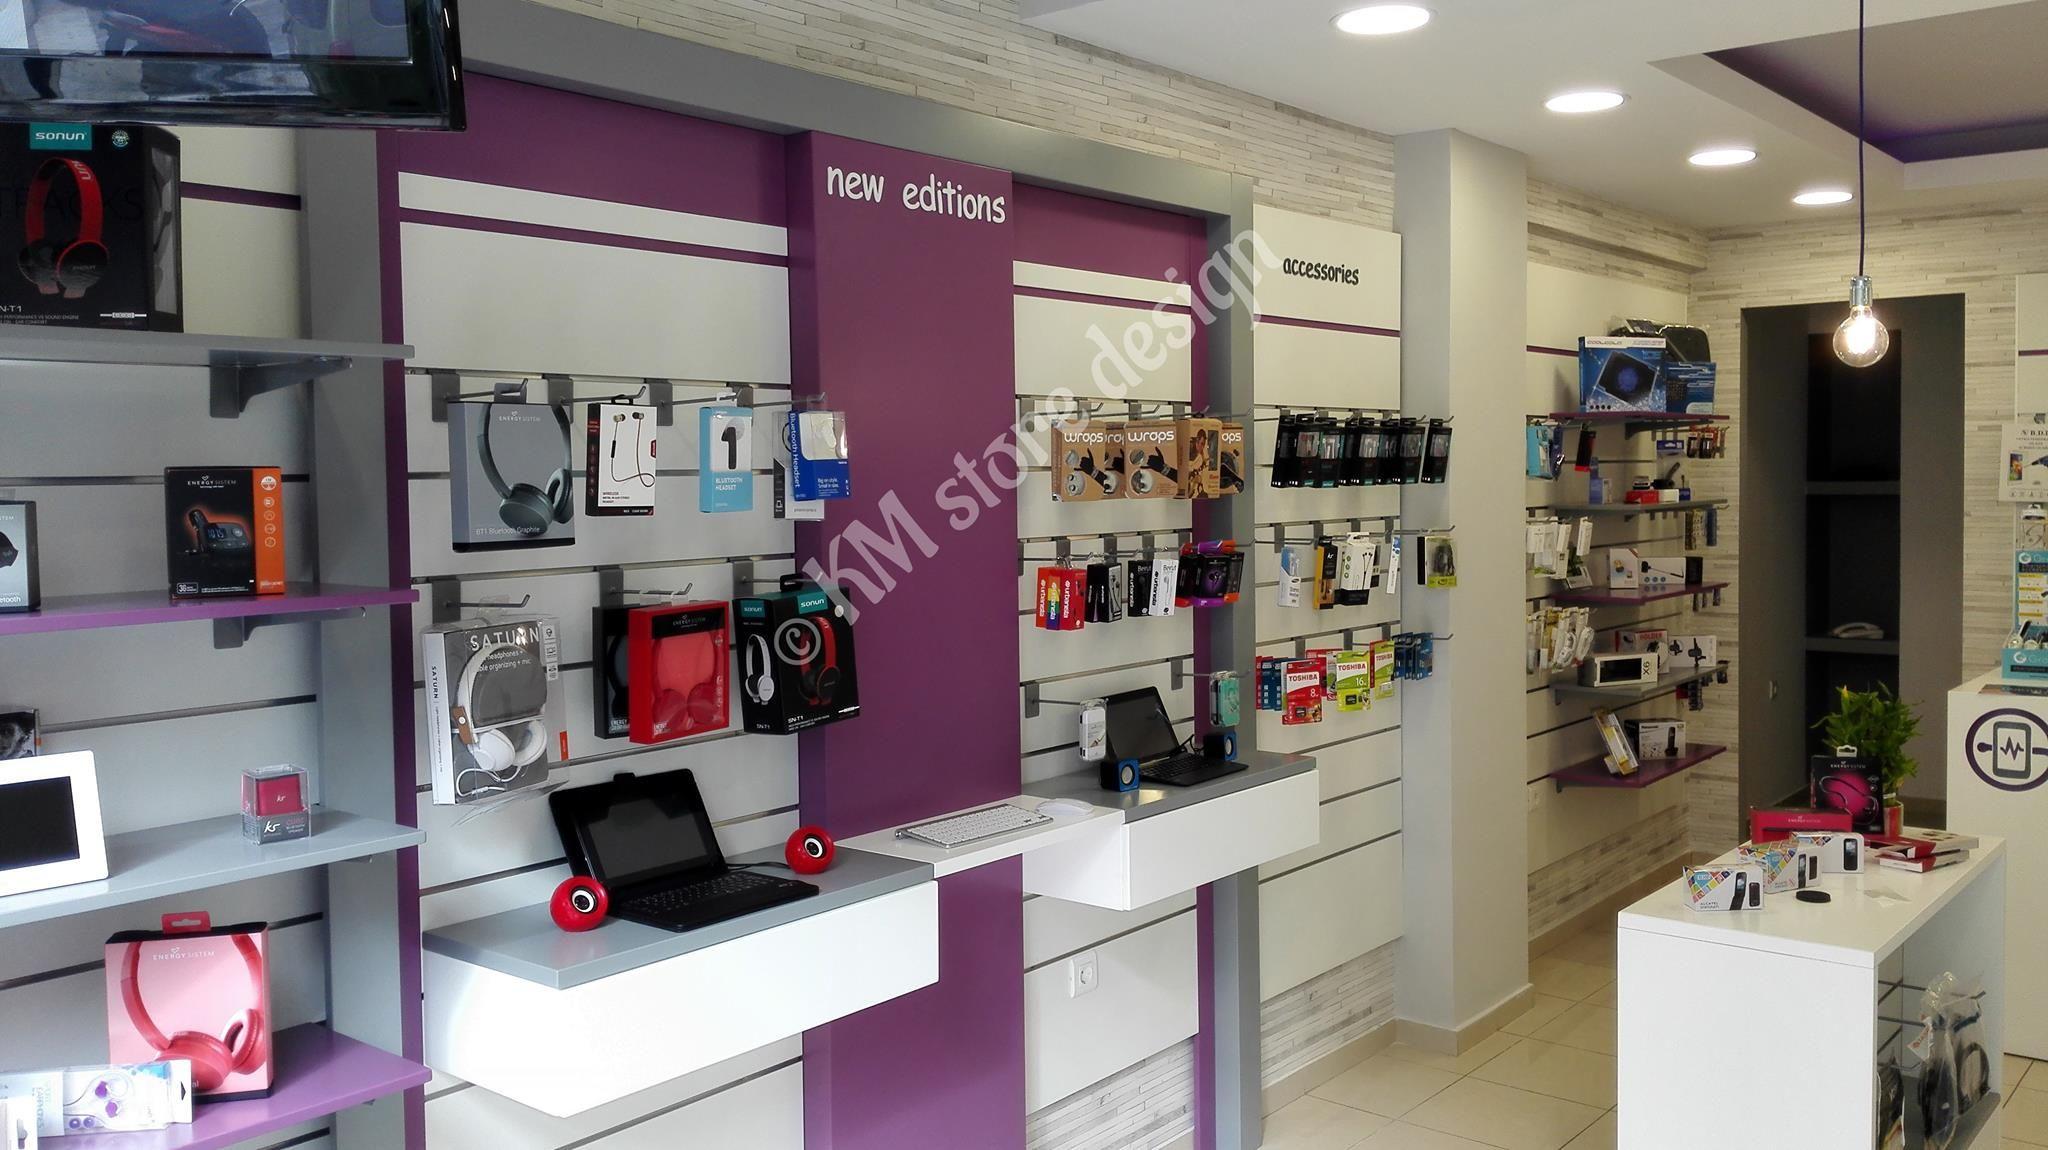 93ba2e57755 Η KM store design υλοποίησε επιτυχώς τον σχεδιασμό, τον εξοπλισμό καθώς και  την επίπλωση καταστήματος